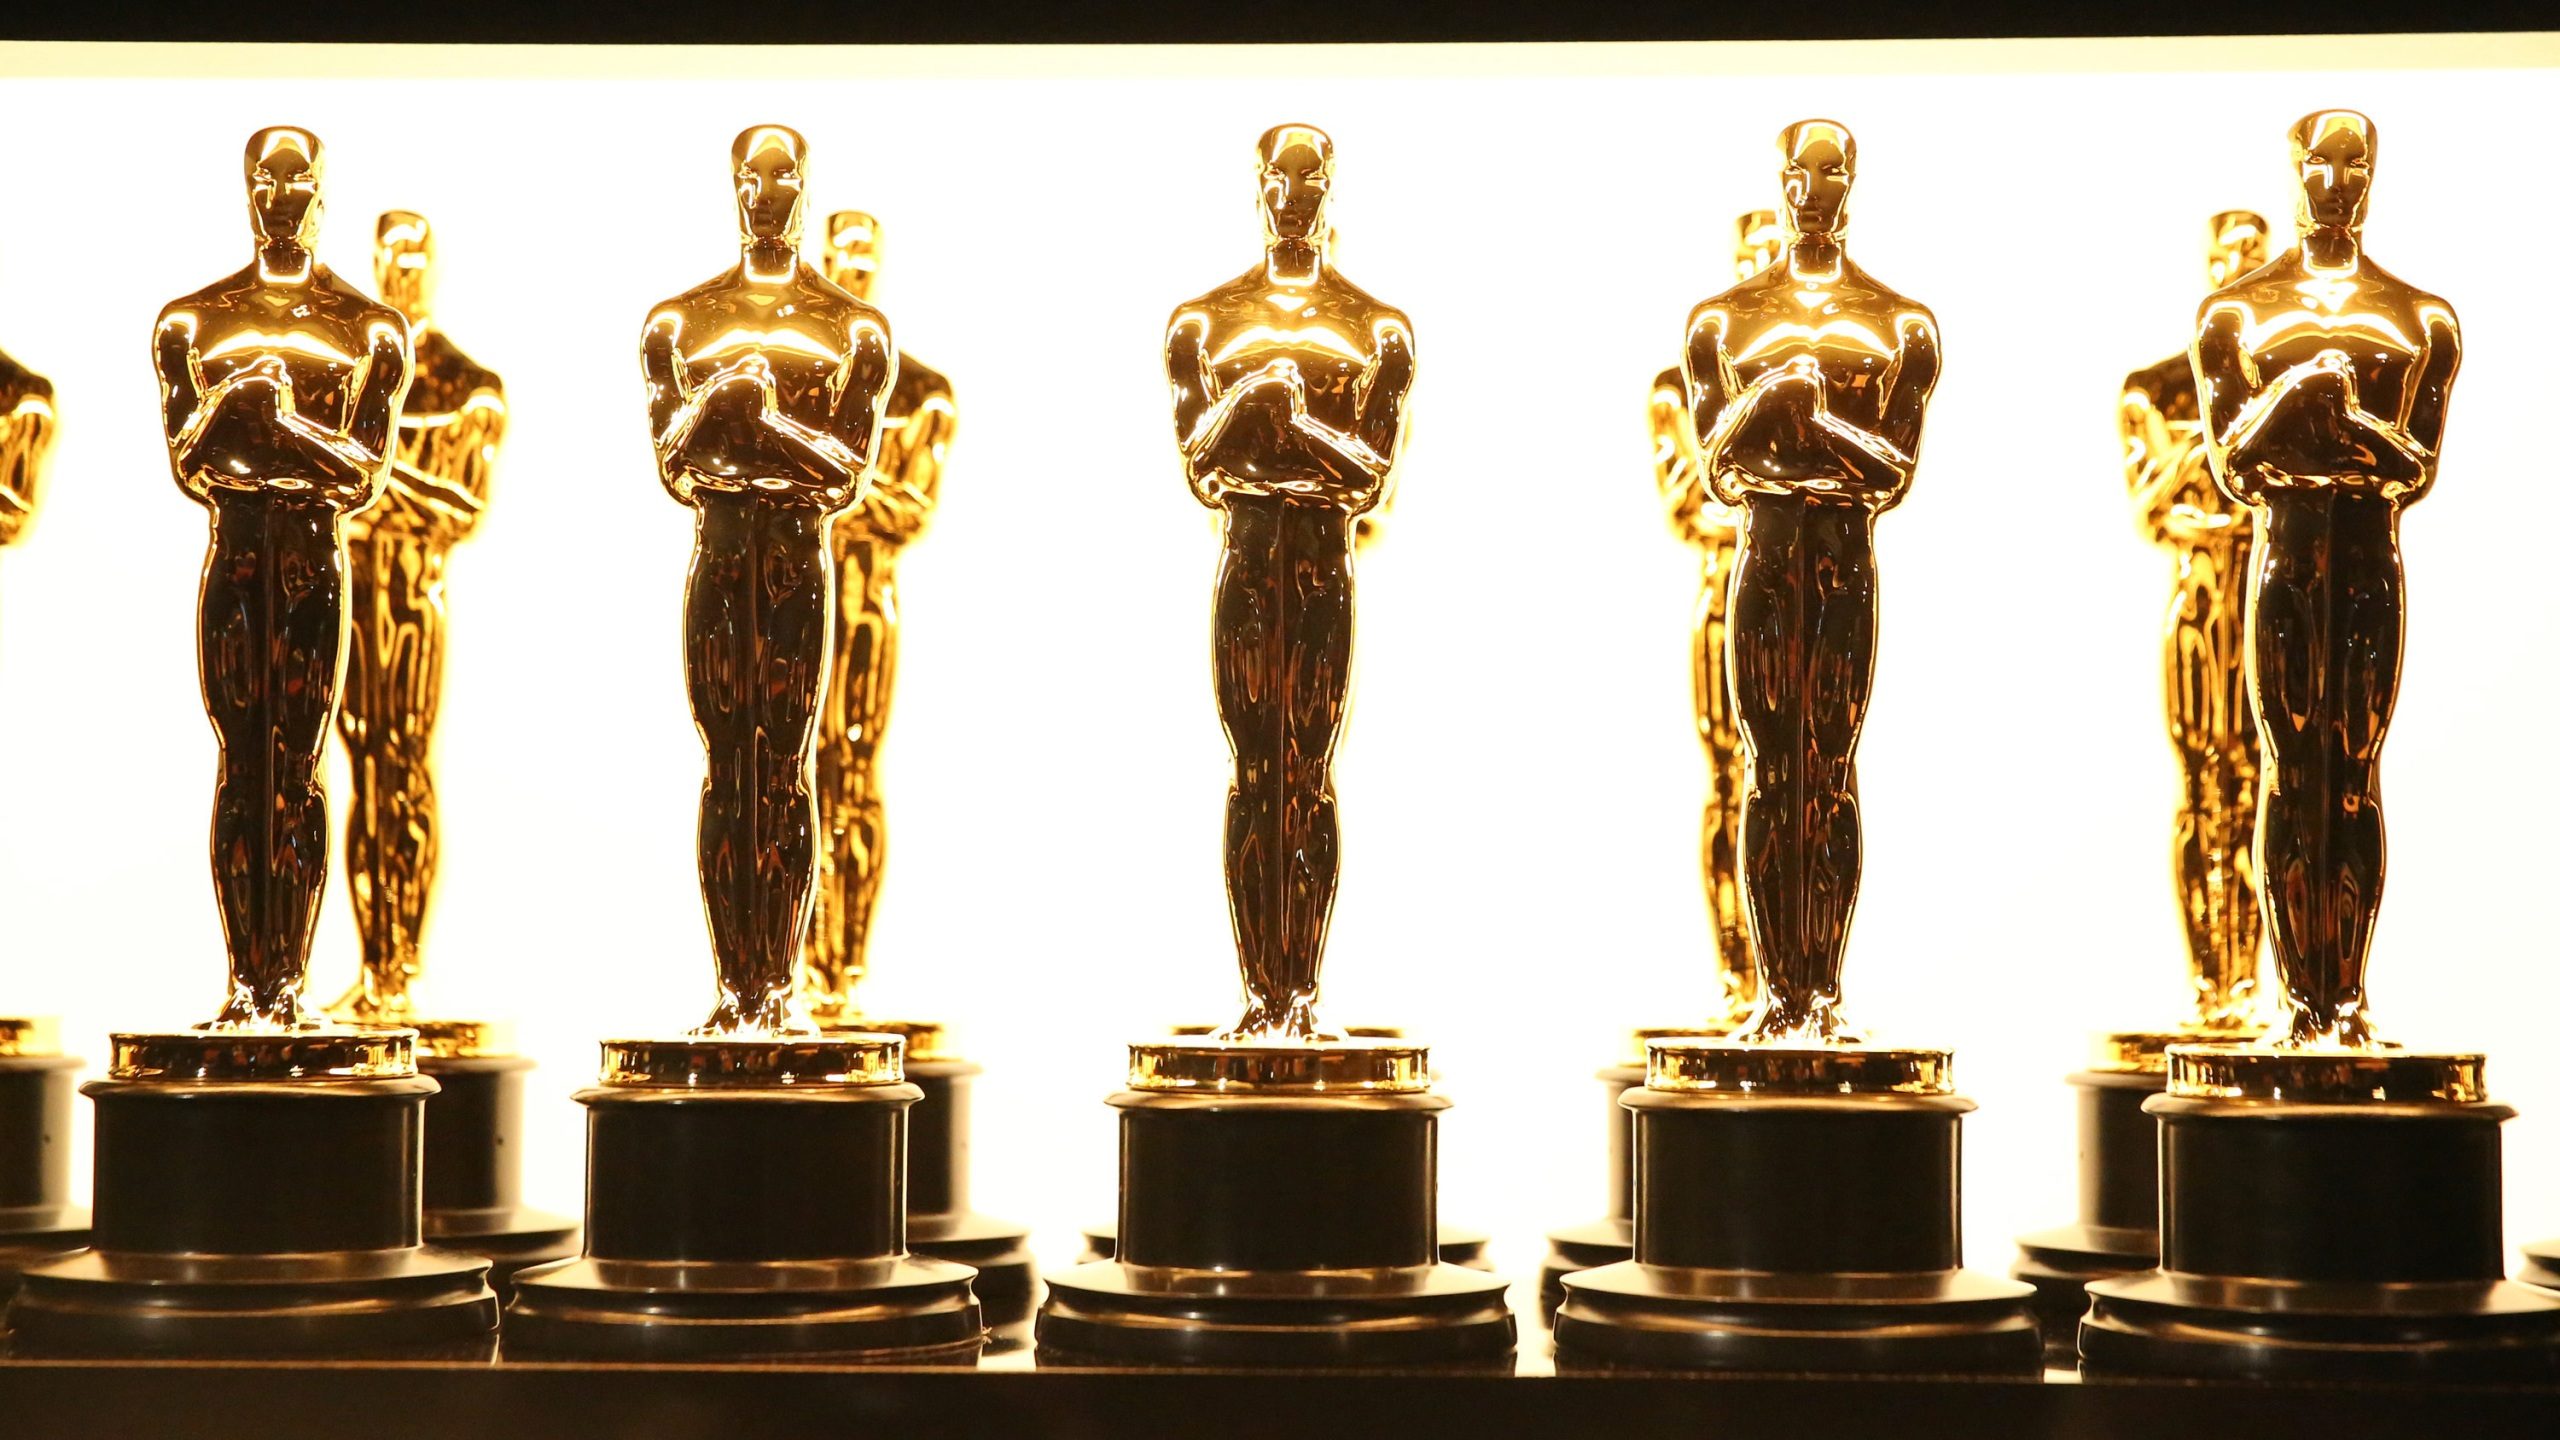 Oscars-Statement_on_Changes_99704-159532.jpg17415585